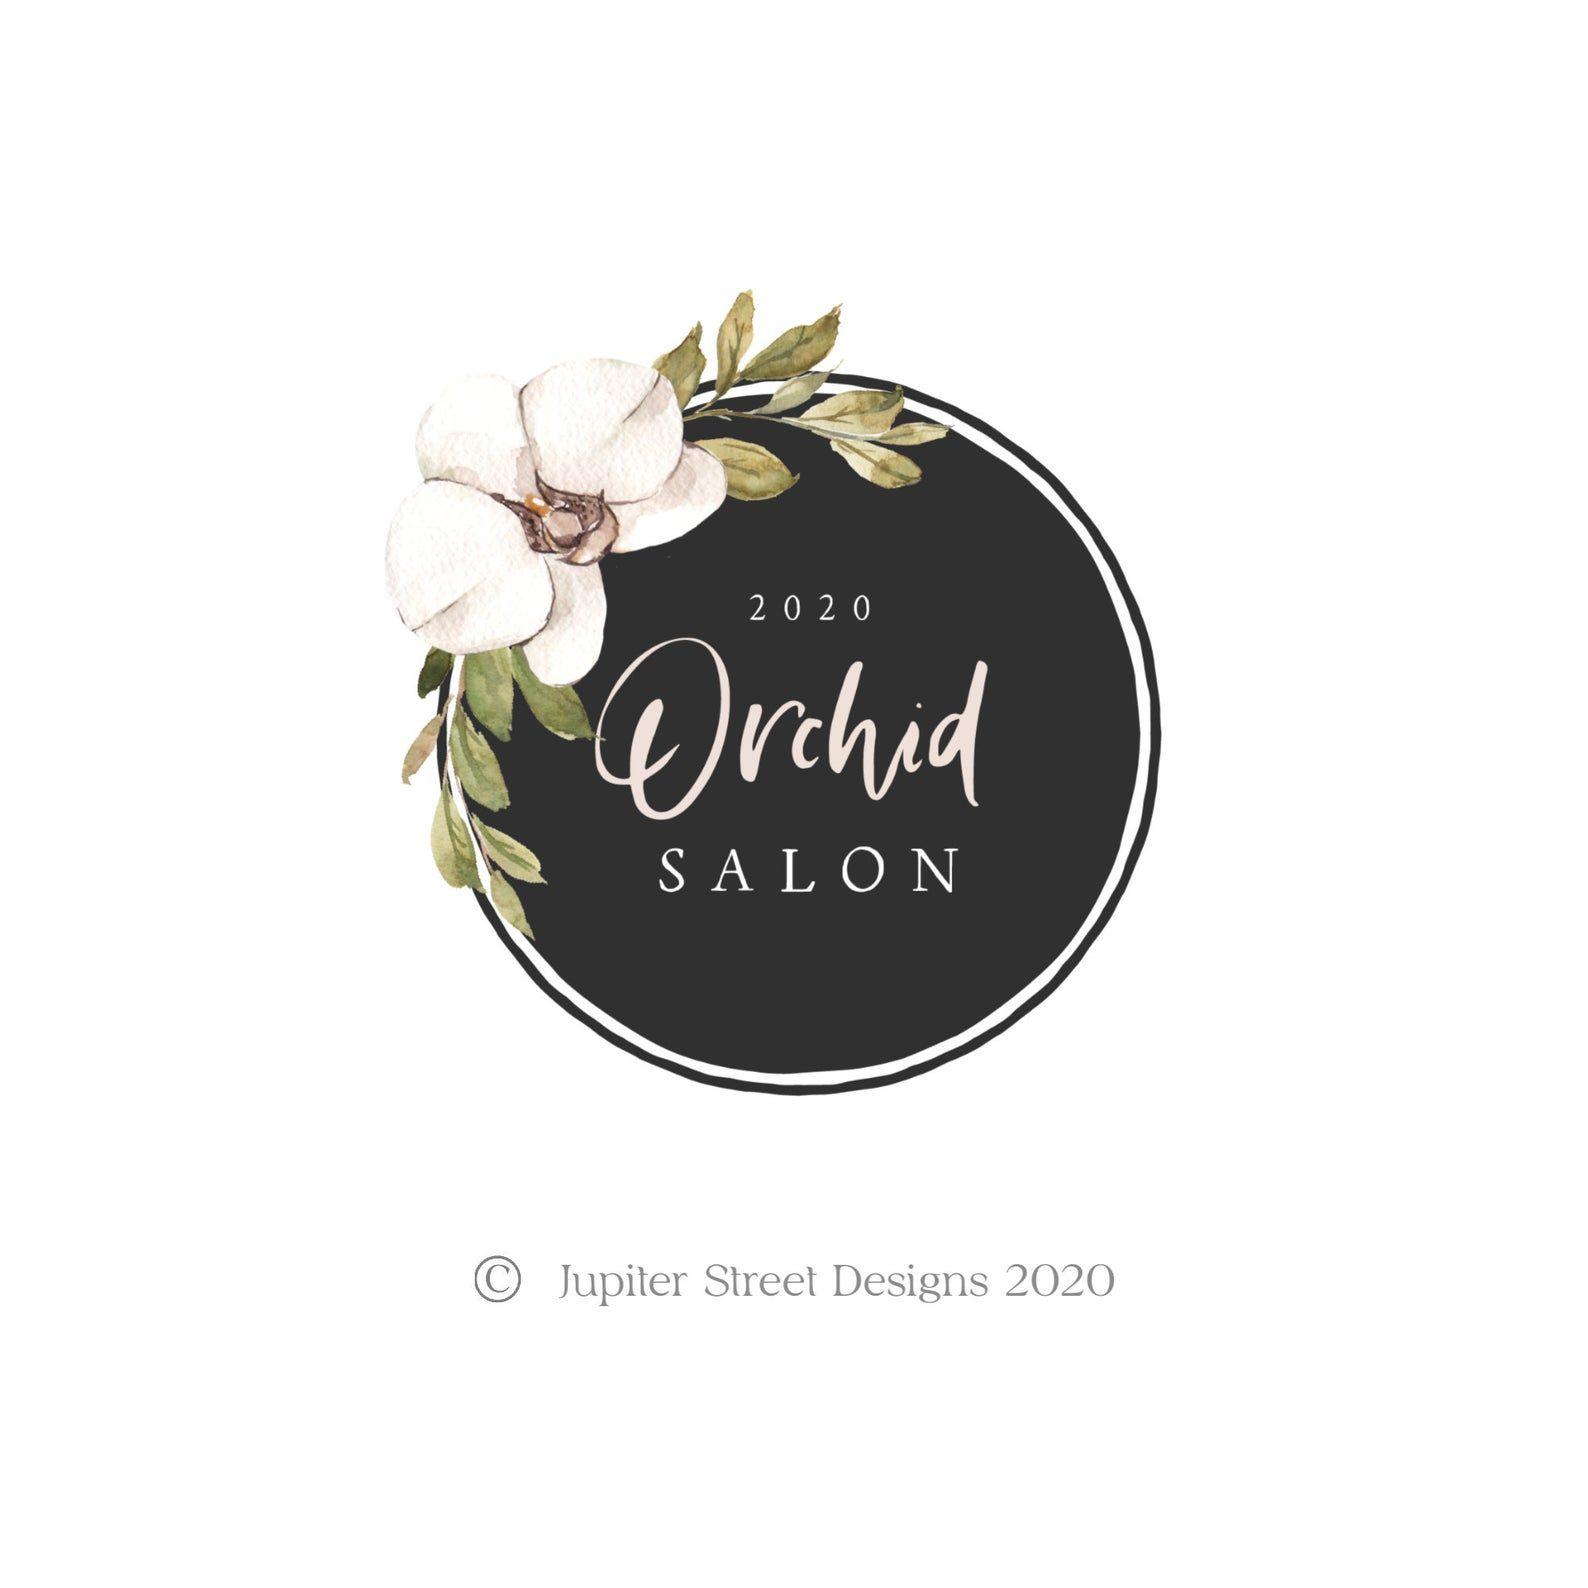 Orchid Logo Flower Logo Design Premade Logo Design Branding Etsy In 2020 Flower Logo Design Flower Logo Premade Logo Design